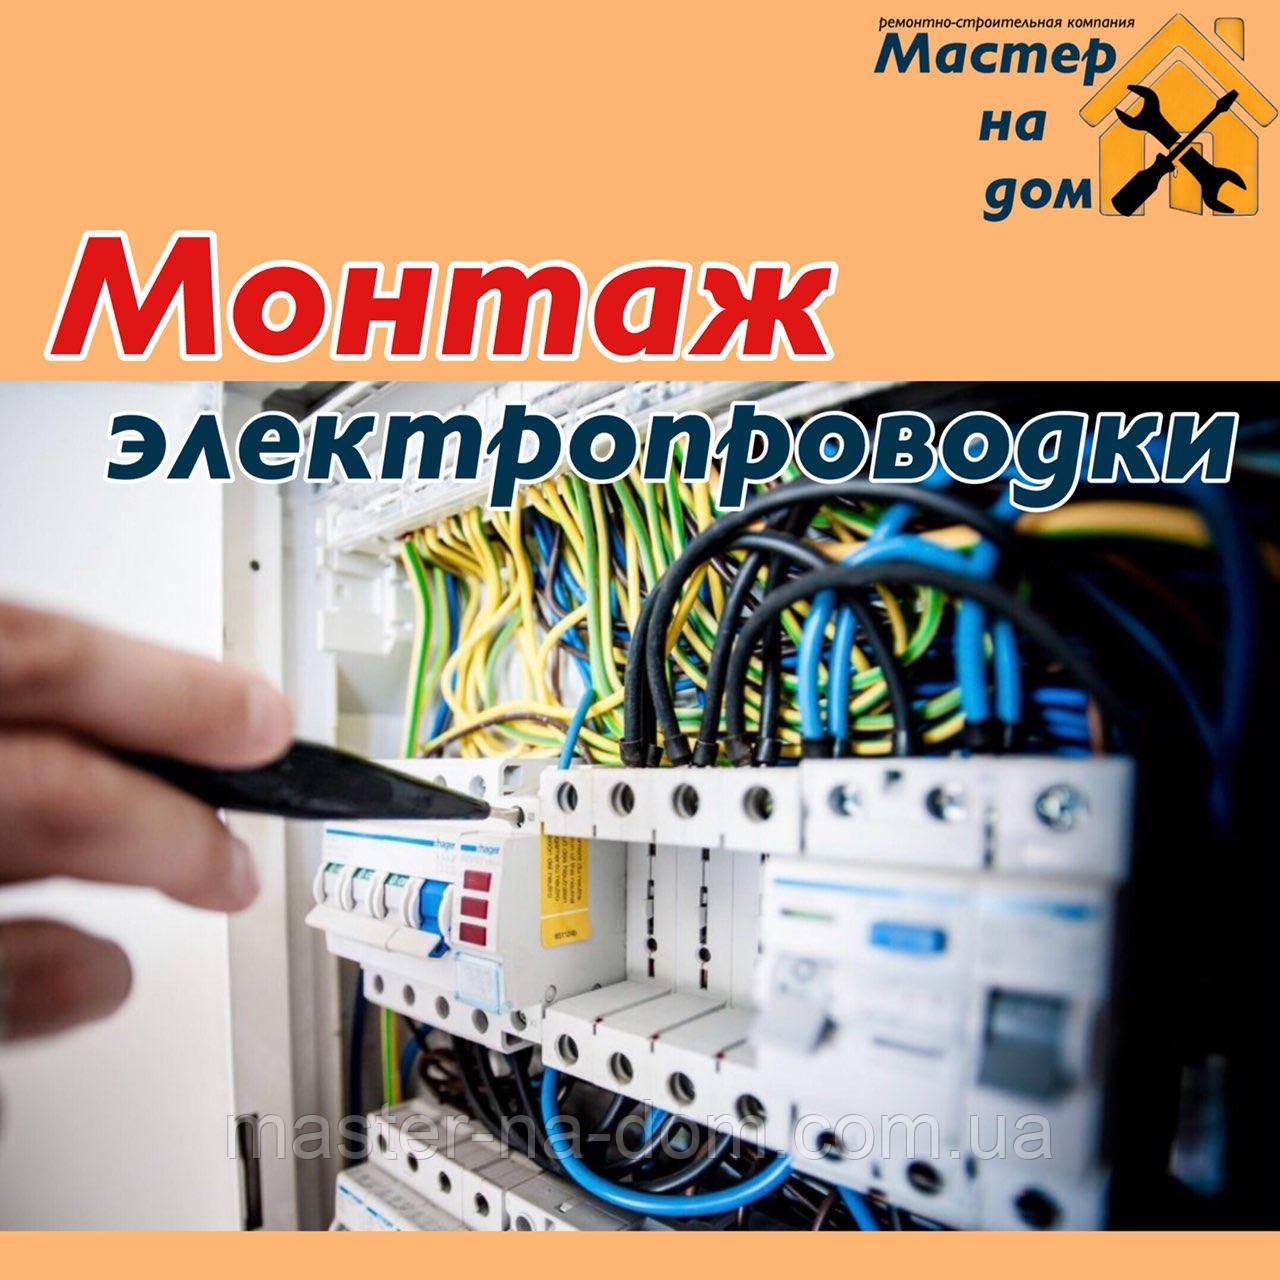 Монтаж электросчётчиков в Сумах